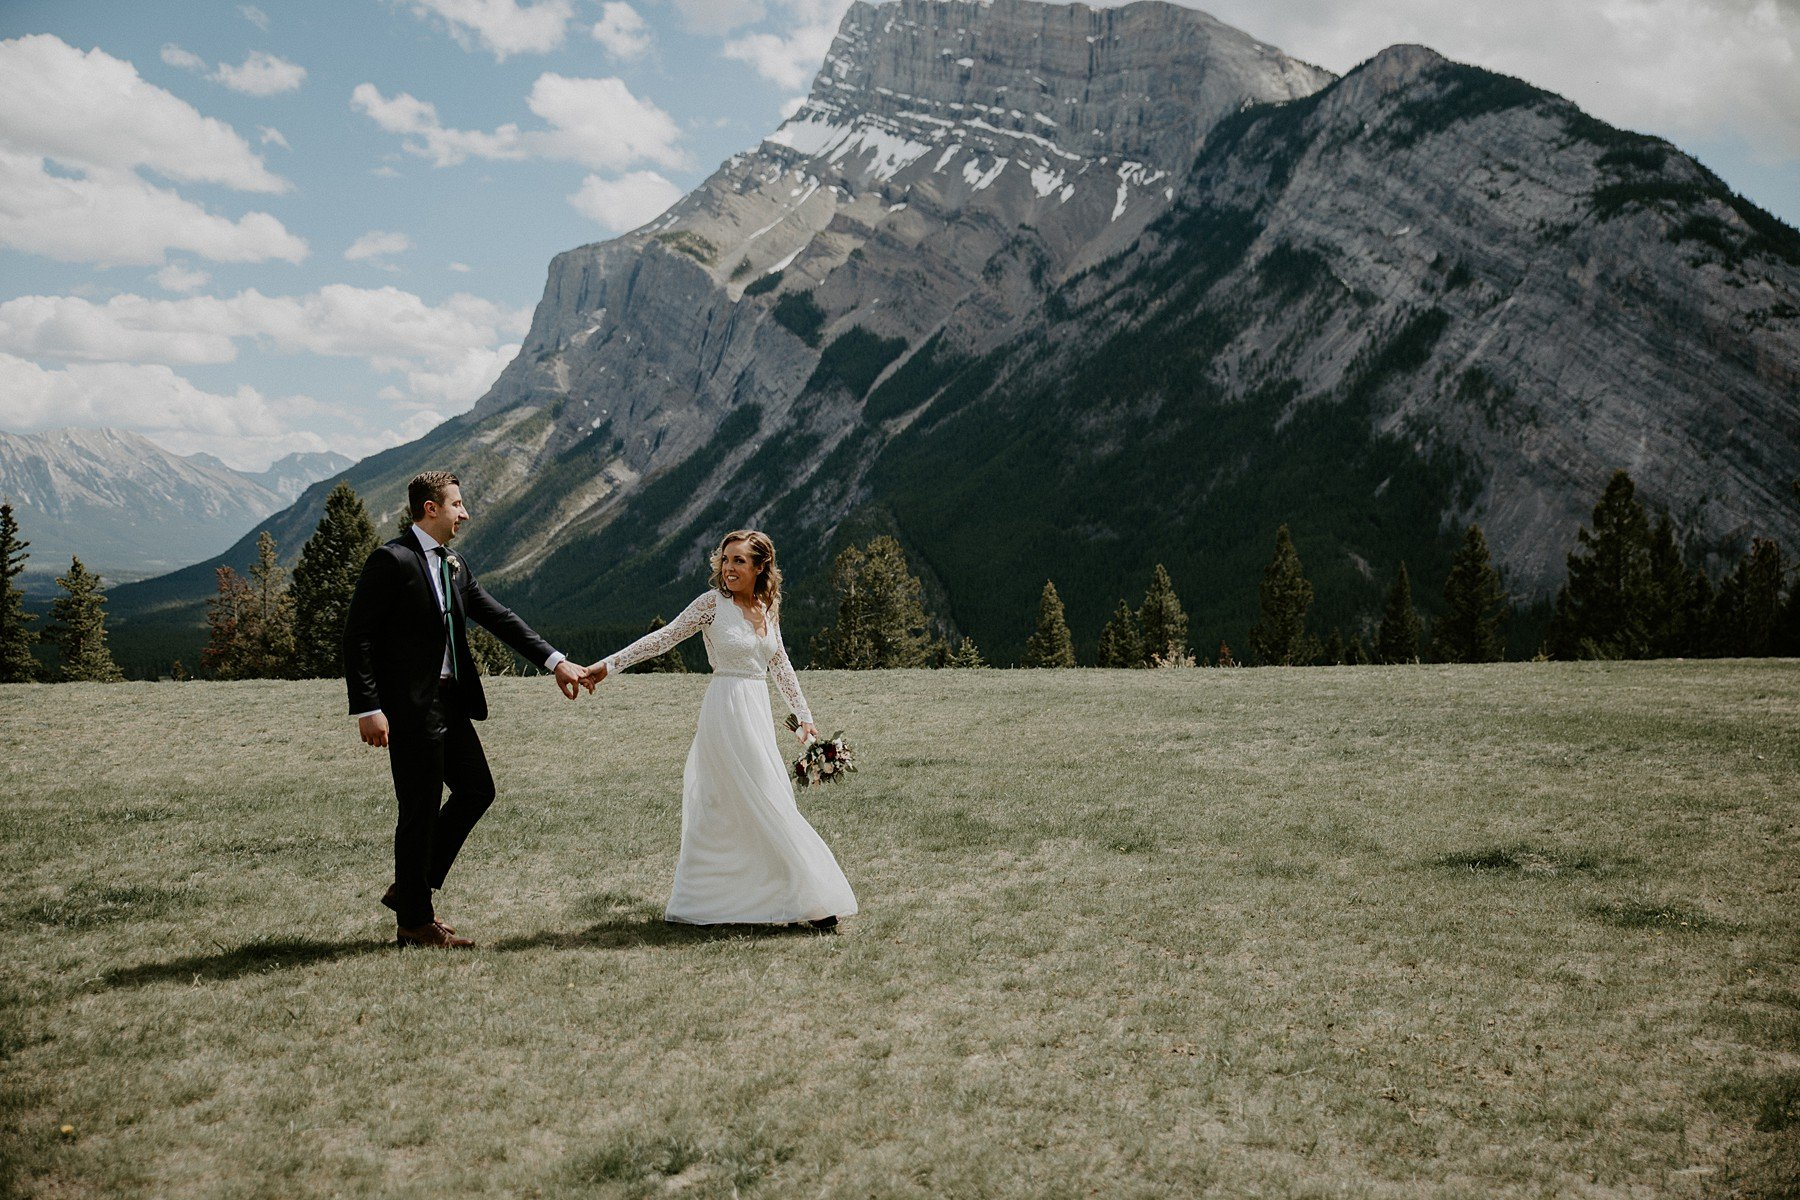 Teller of Tales Photography - Elopement - Tunnel Mountain Banff-69.jpg